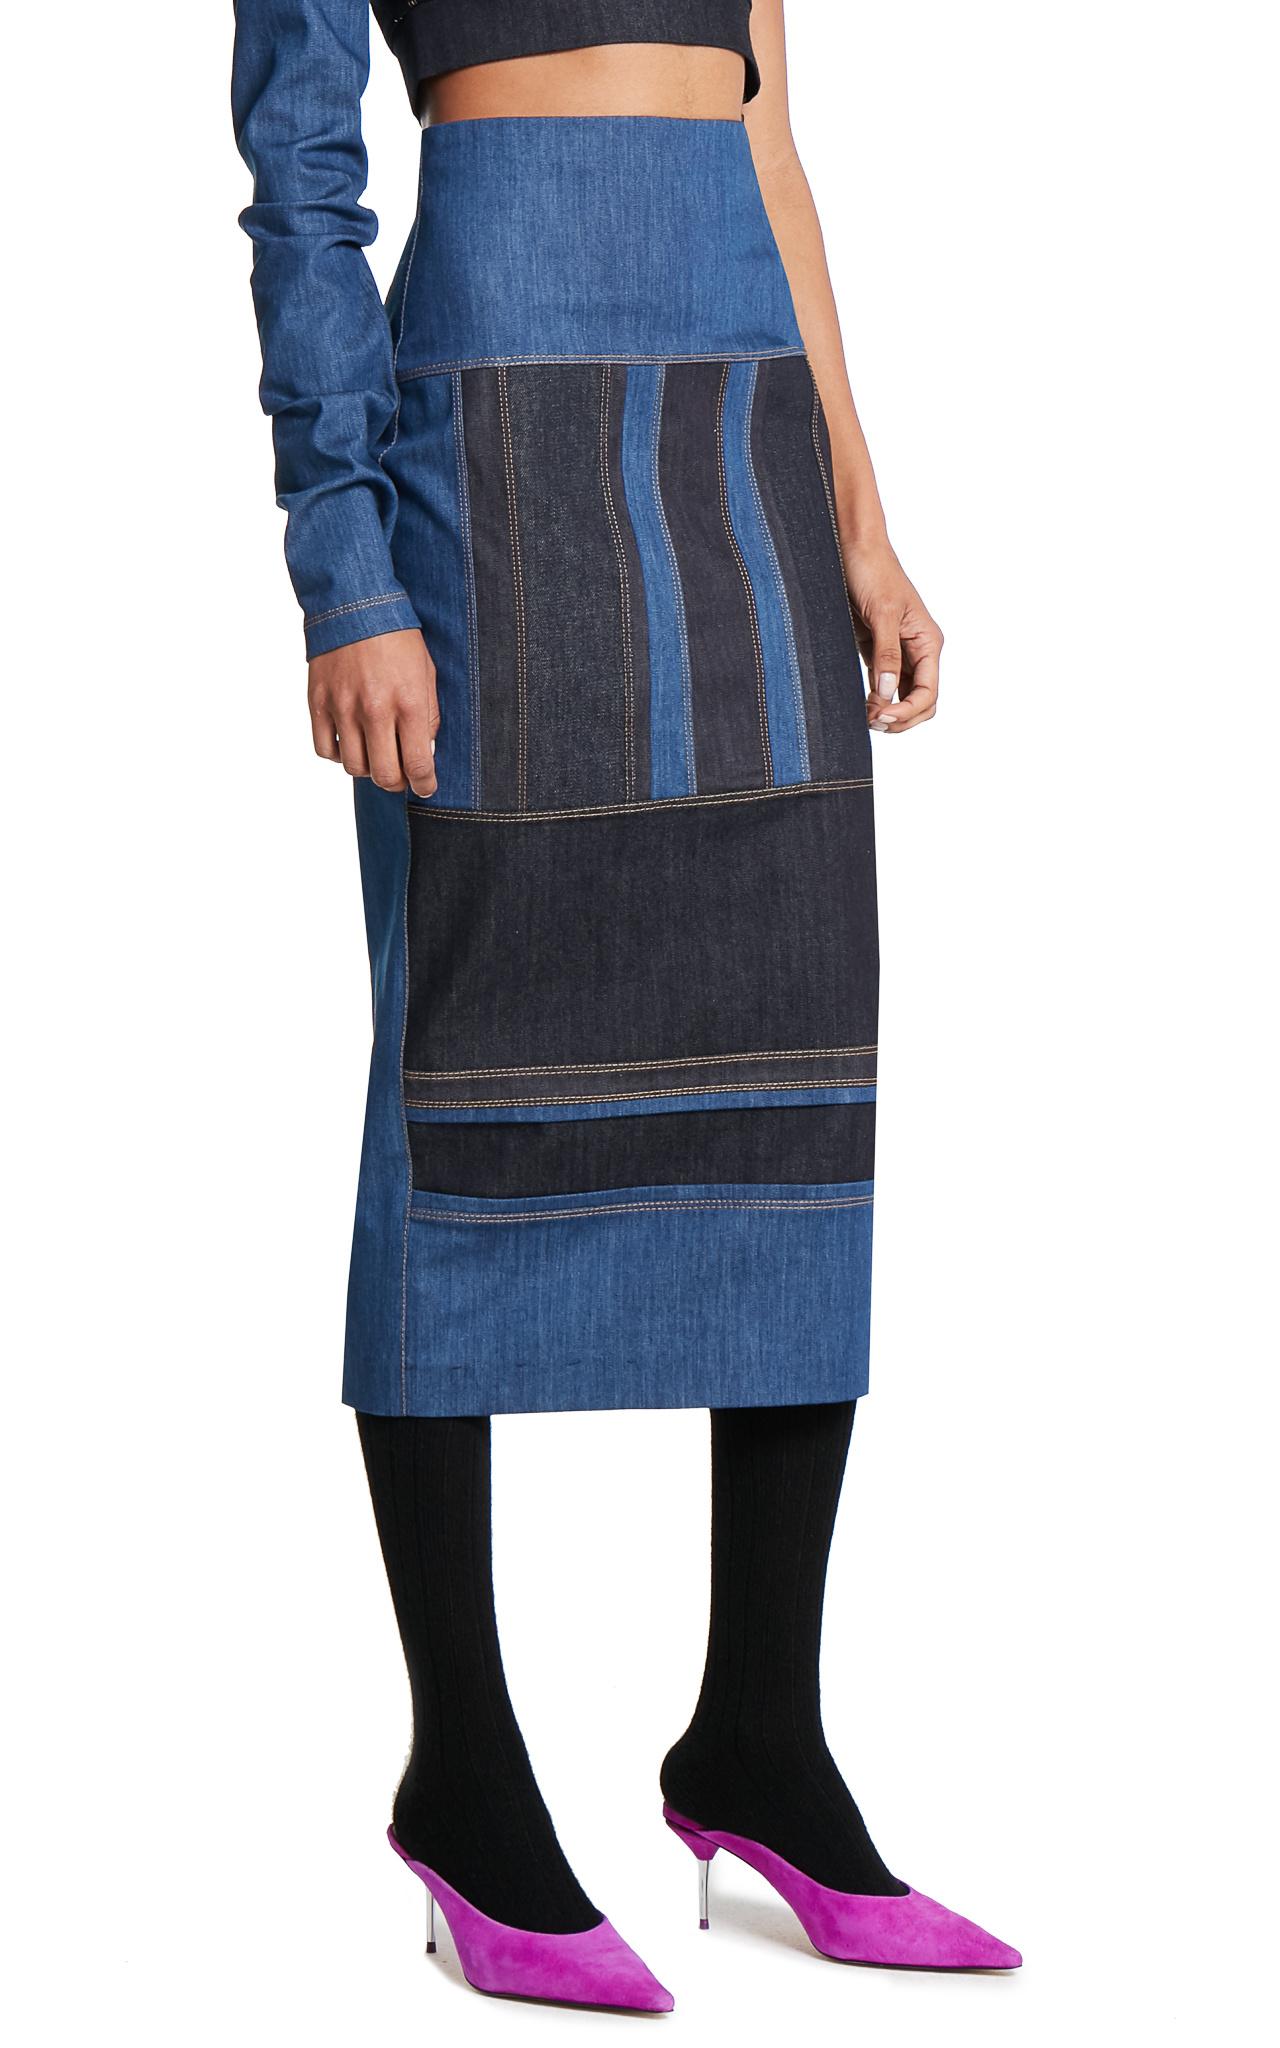 NO KA'OI Denim Pencil skirt